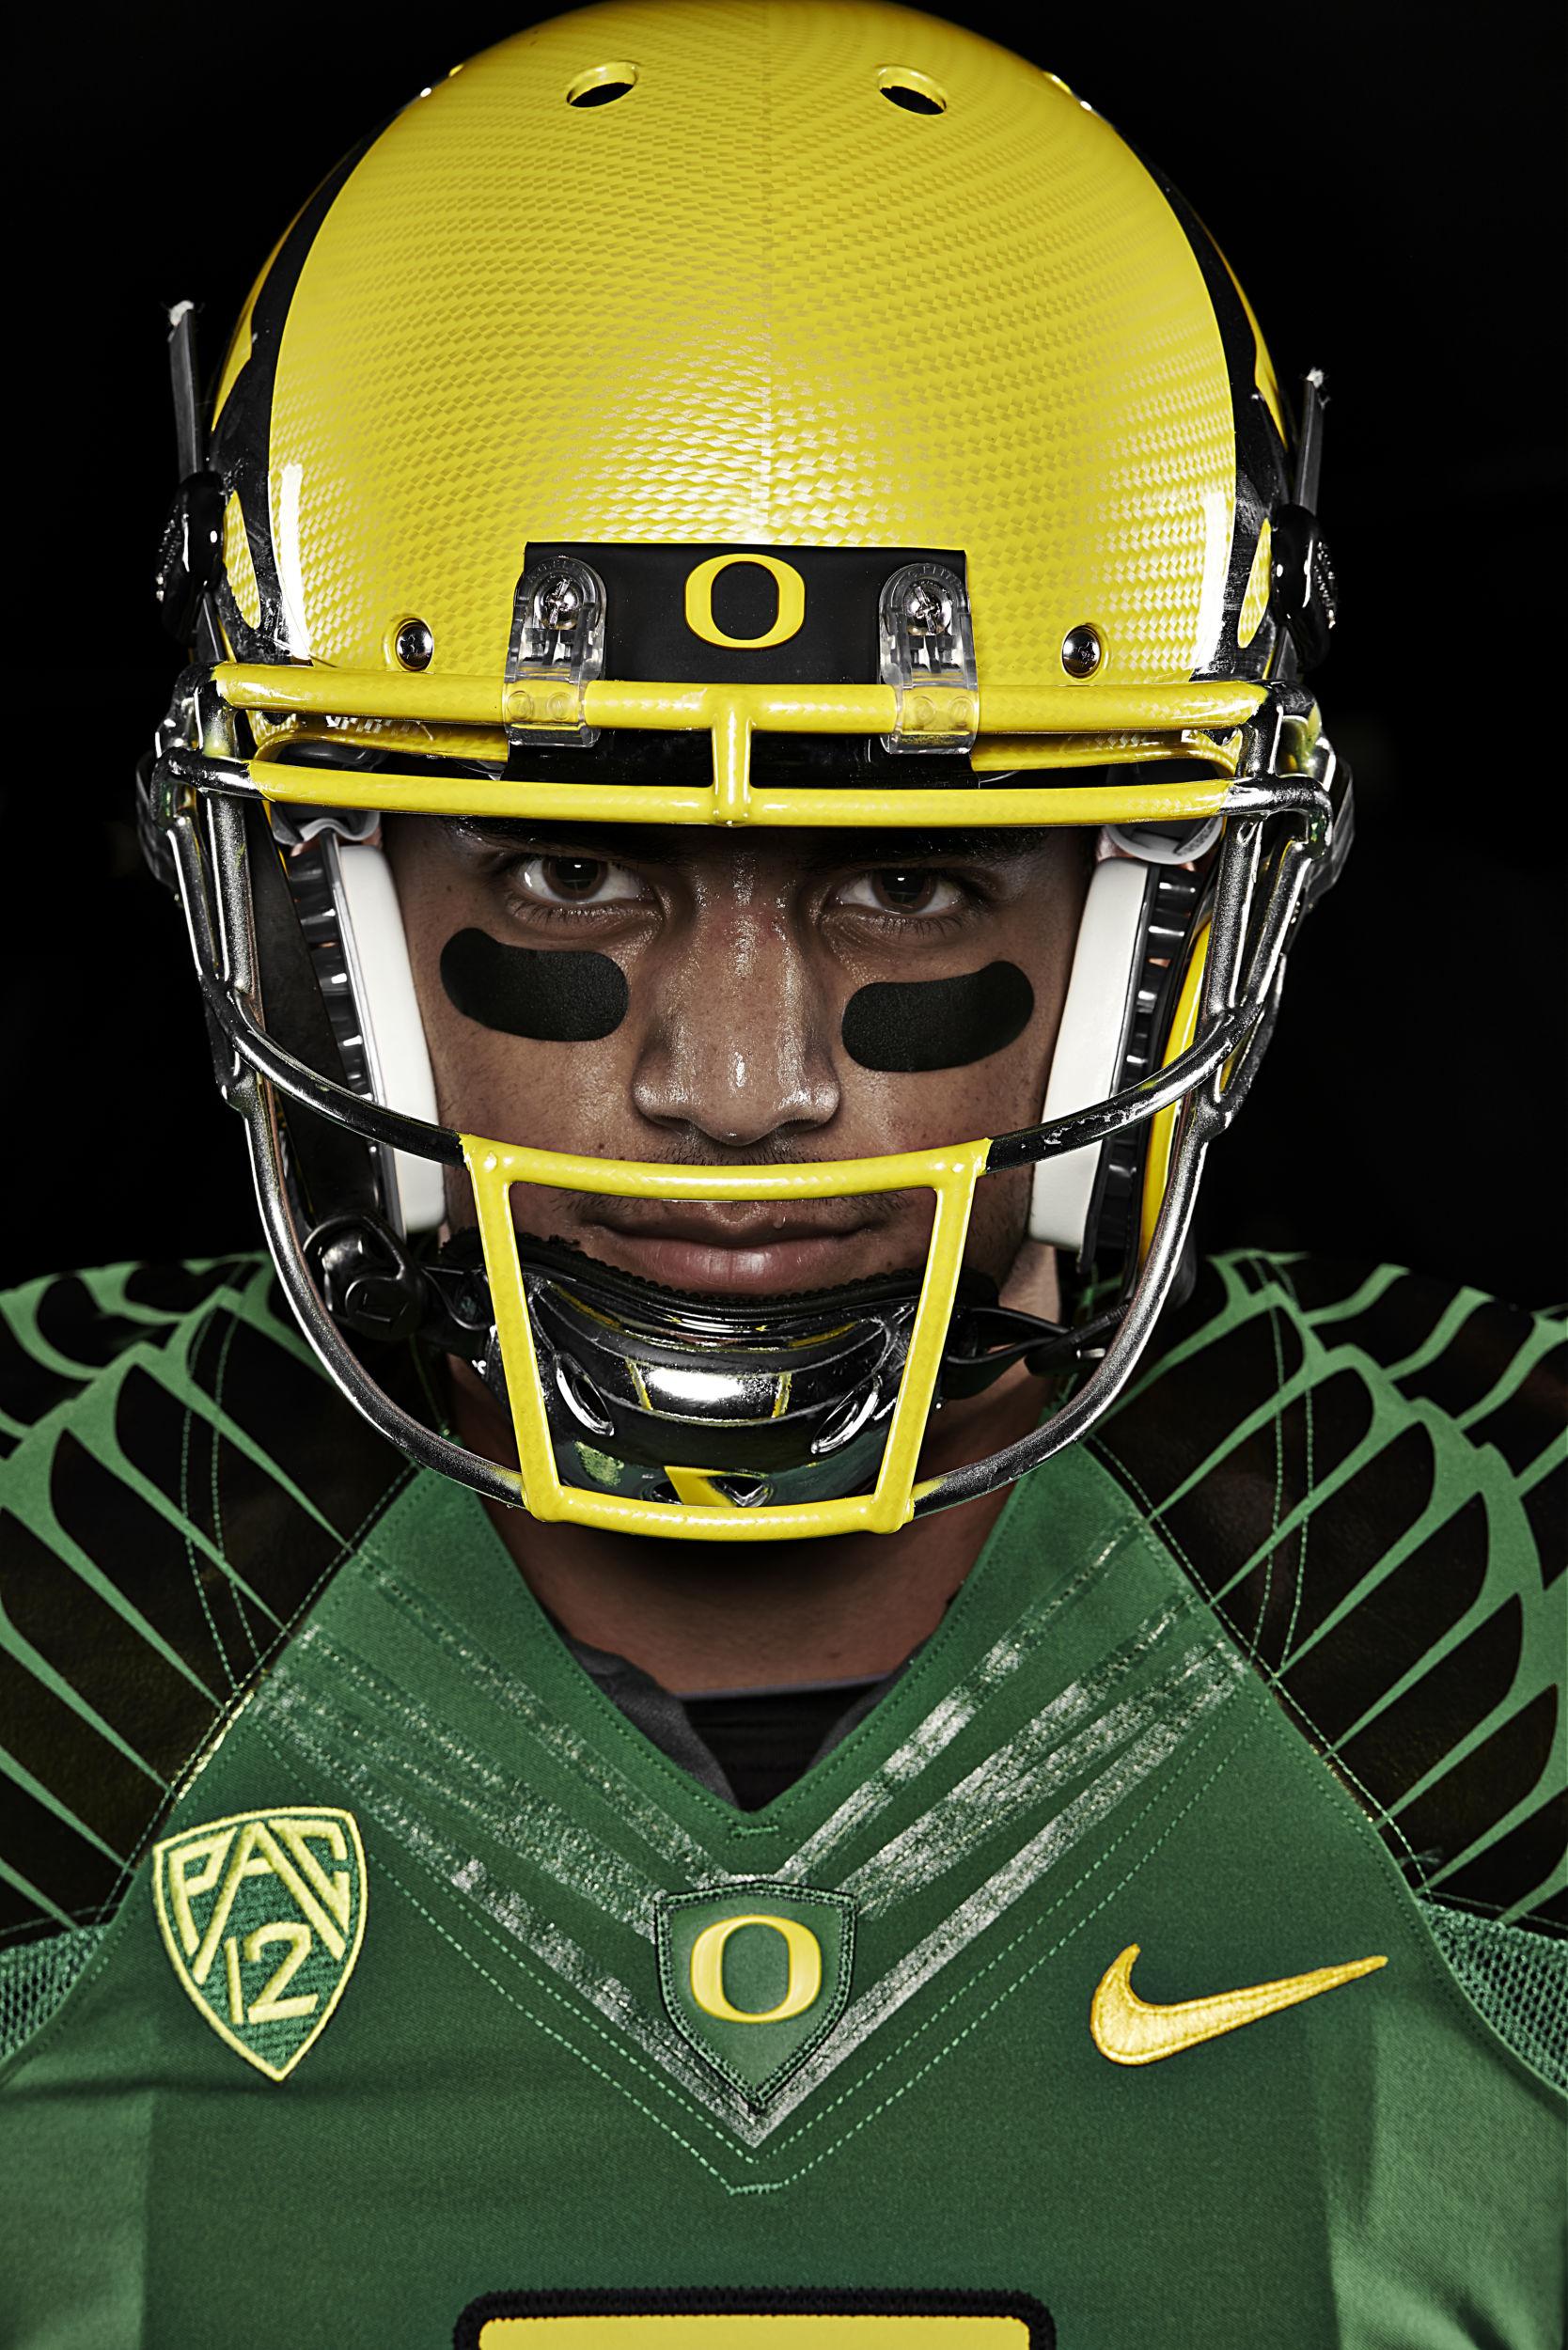 University of Oregon Football quarterback